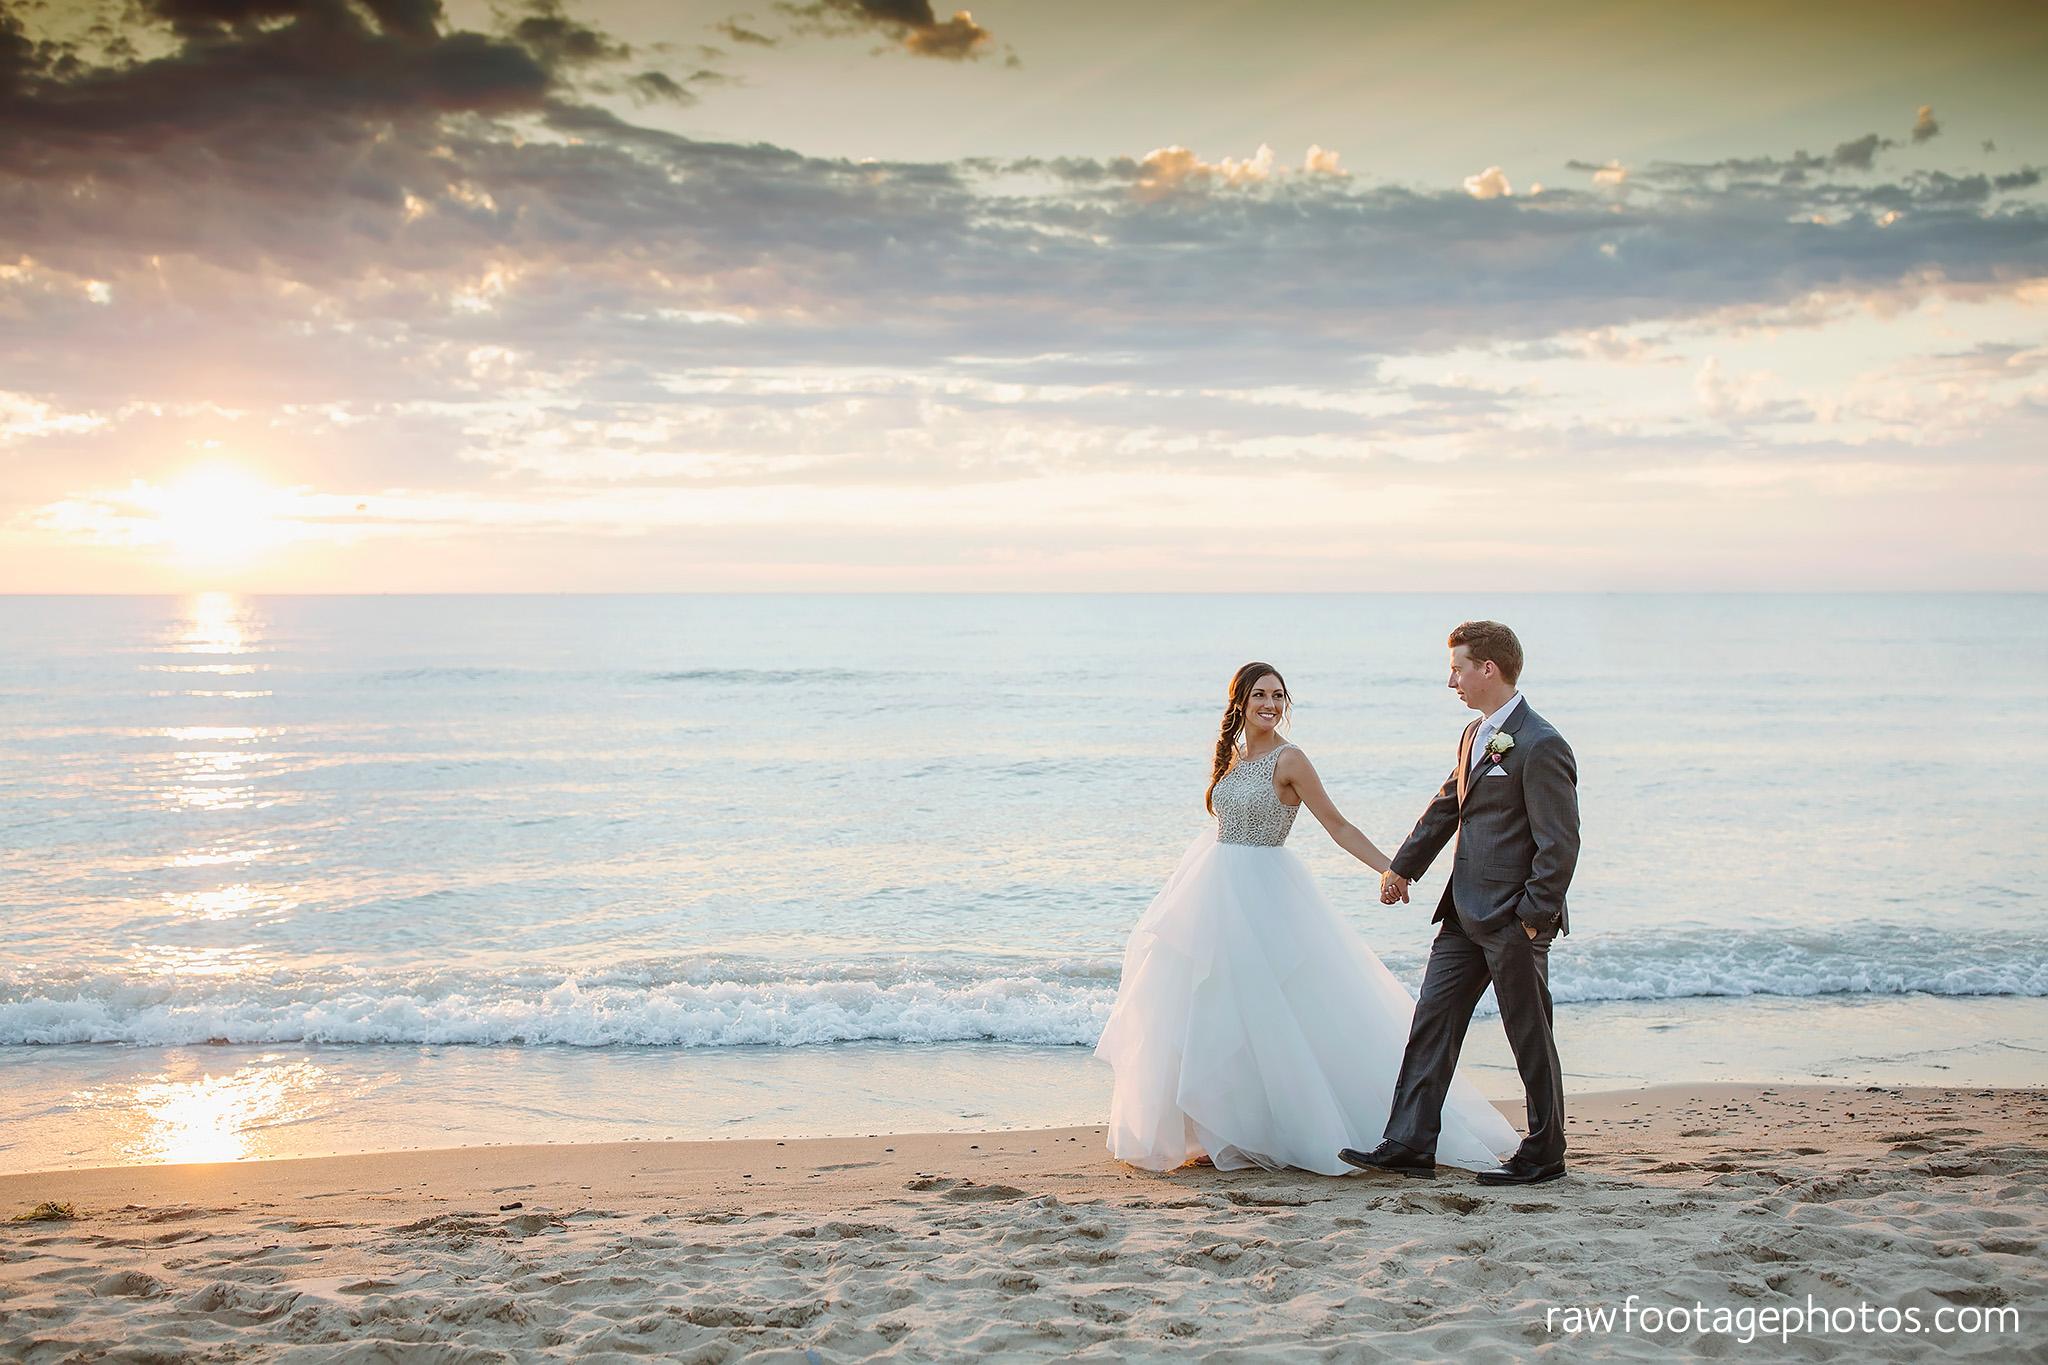 london_ontario_wedding_photographer-grand_bend_wedding_photographer-oakwood_resort_wedding-beach_wedding-sunset_wedding-raw_footage_photography068.jpg